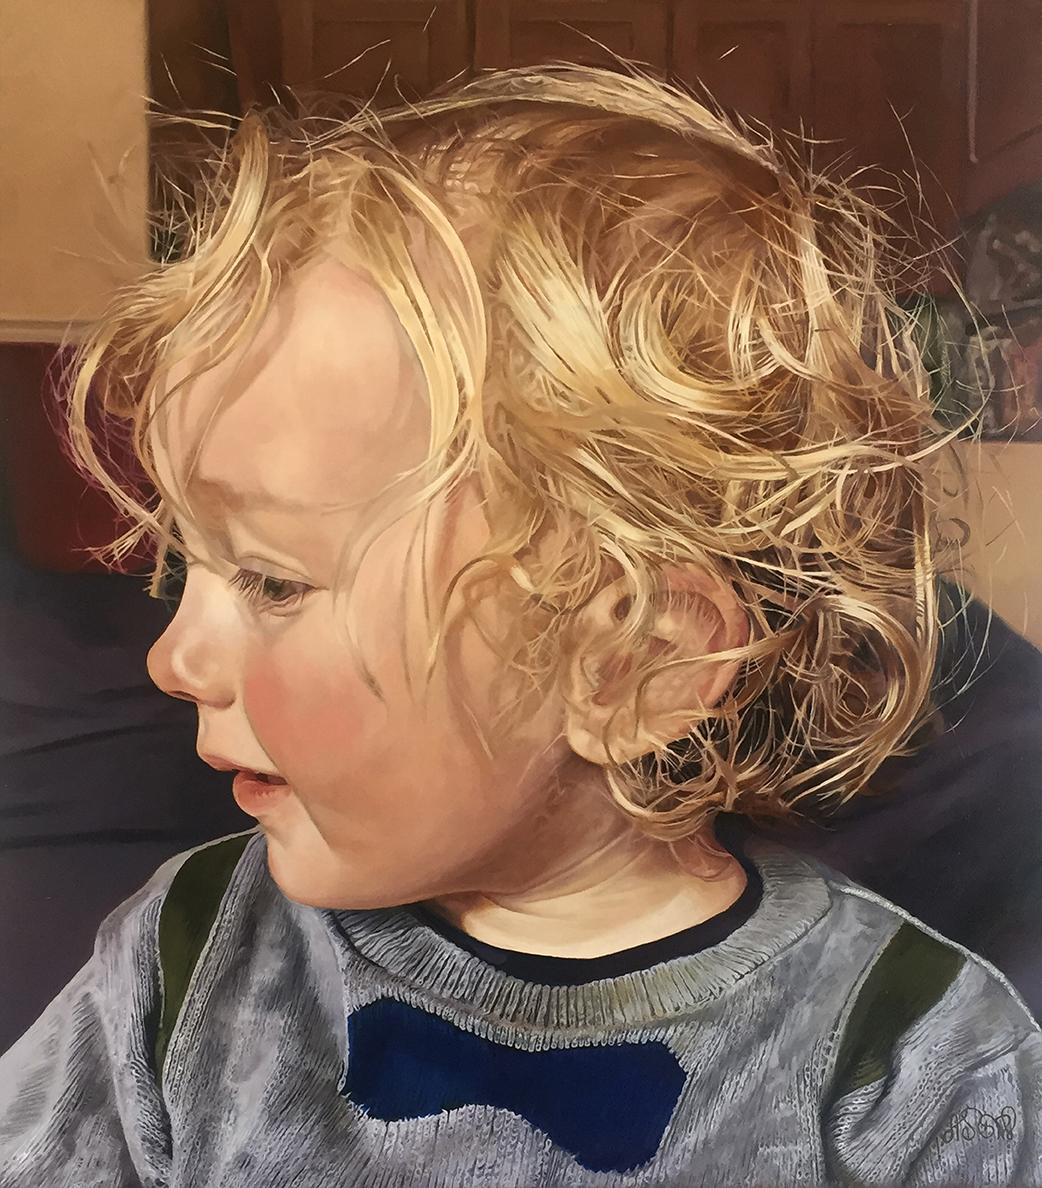 ADAM WALLACE, Alfie, Third Prize, SPA Fine Art 2018